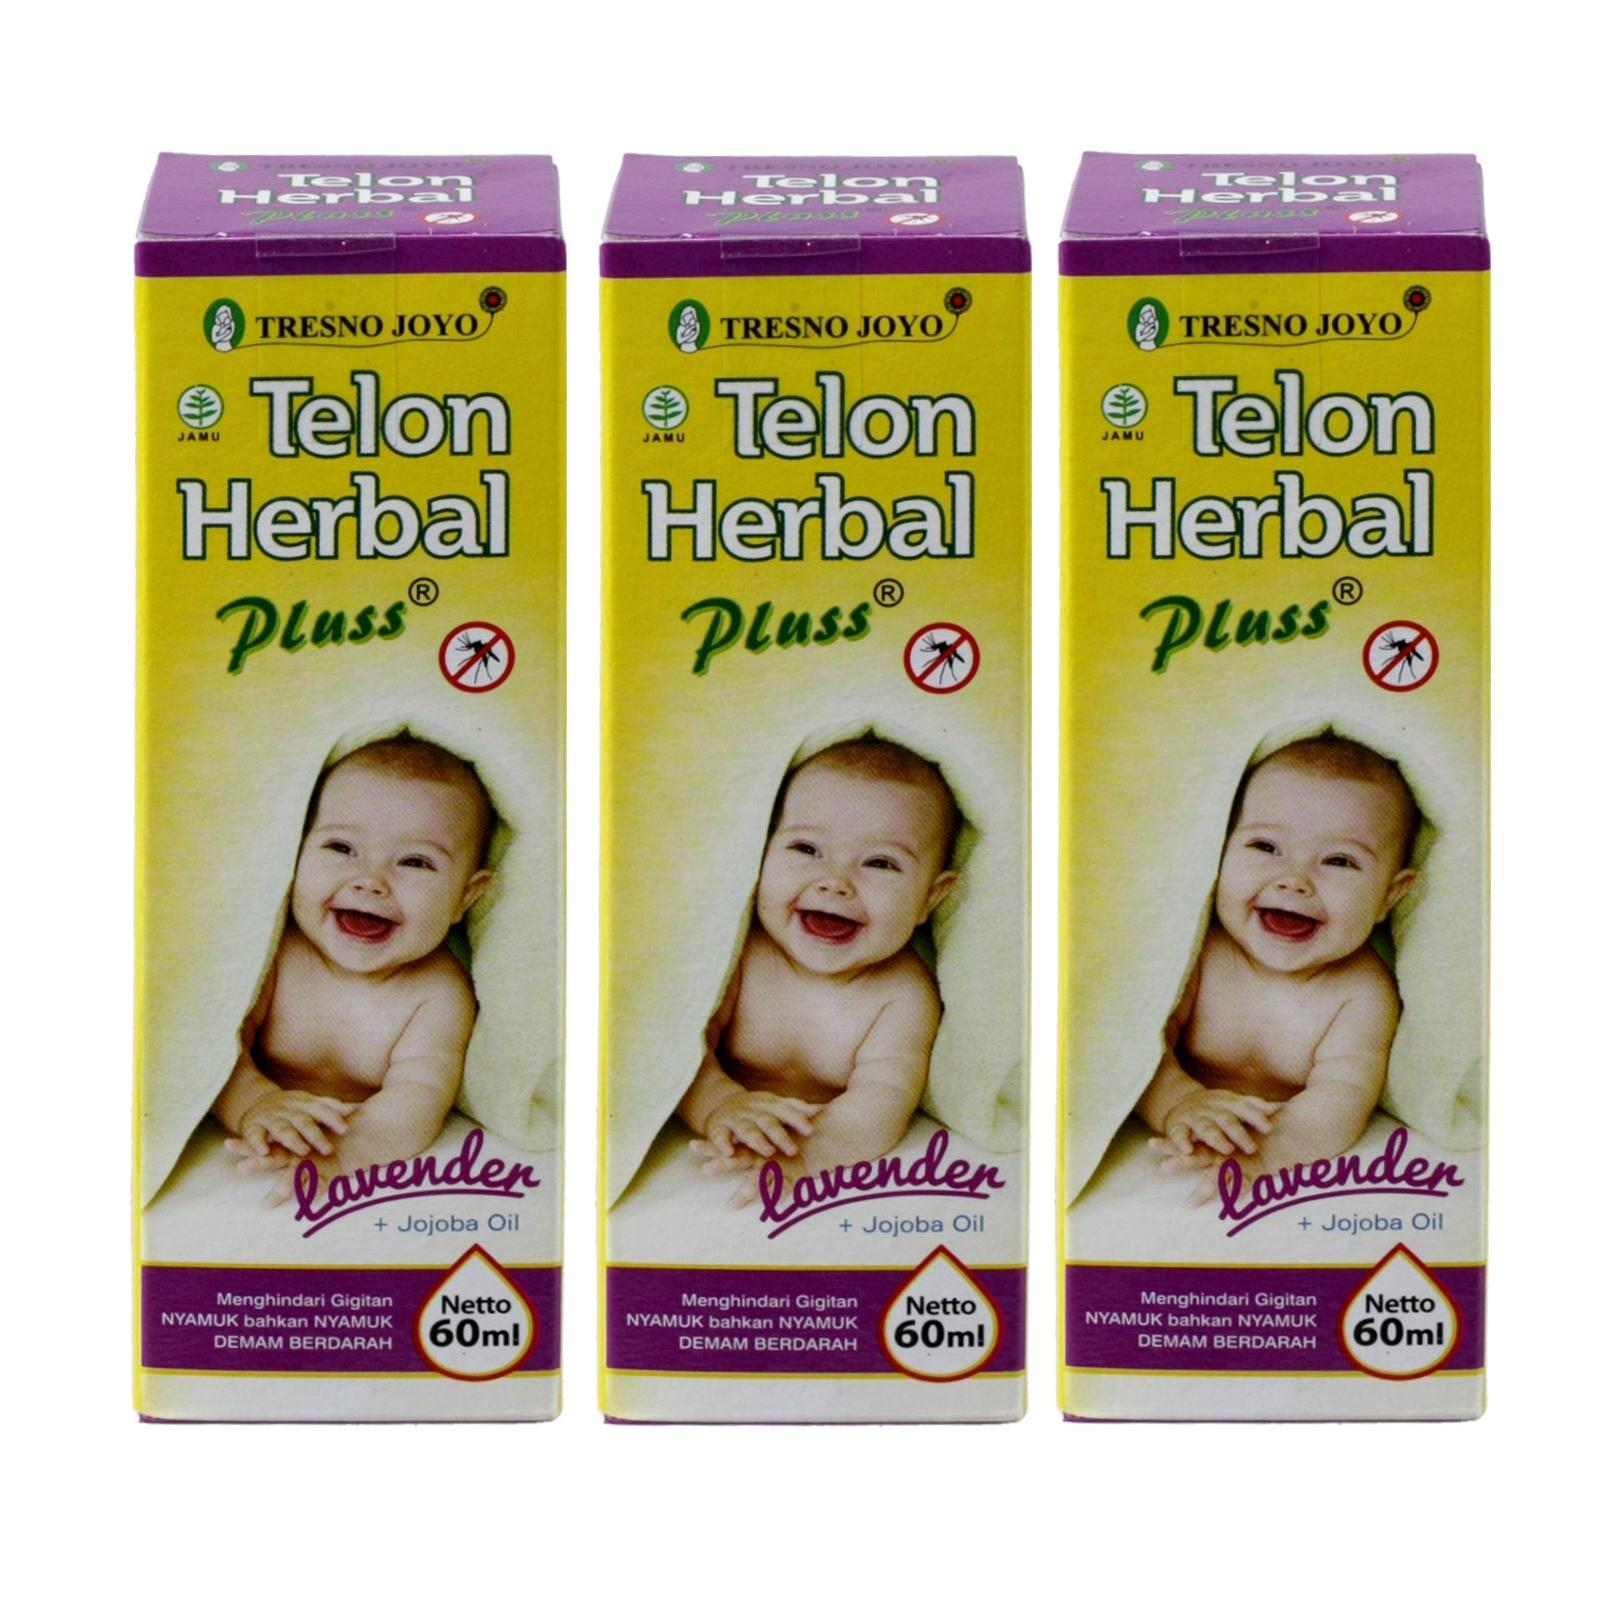 Tresno Joyo Minyak Telon Herbal Pluss Jojoba Oil -Lavender Anti Nyamuk 60ml (isi 3 botol)